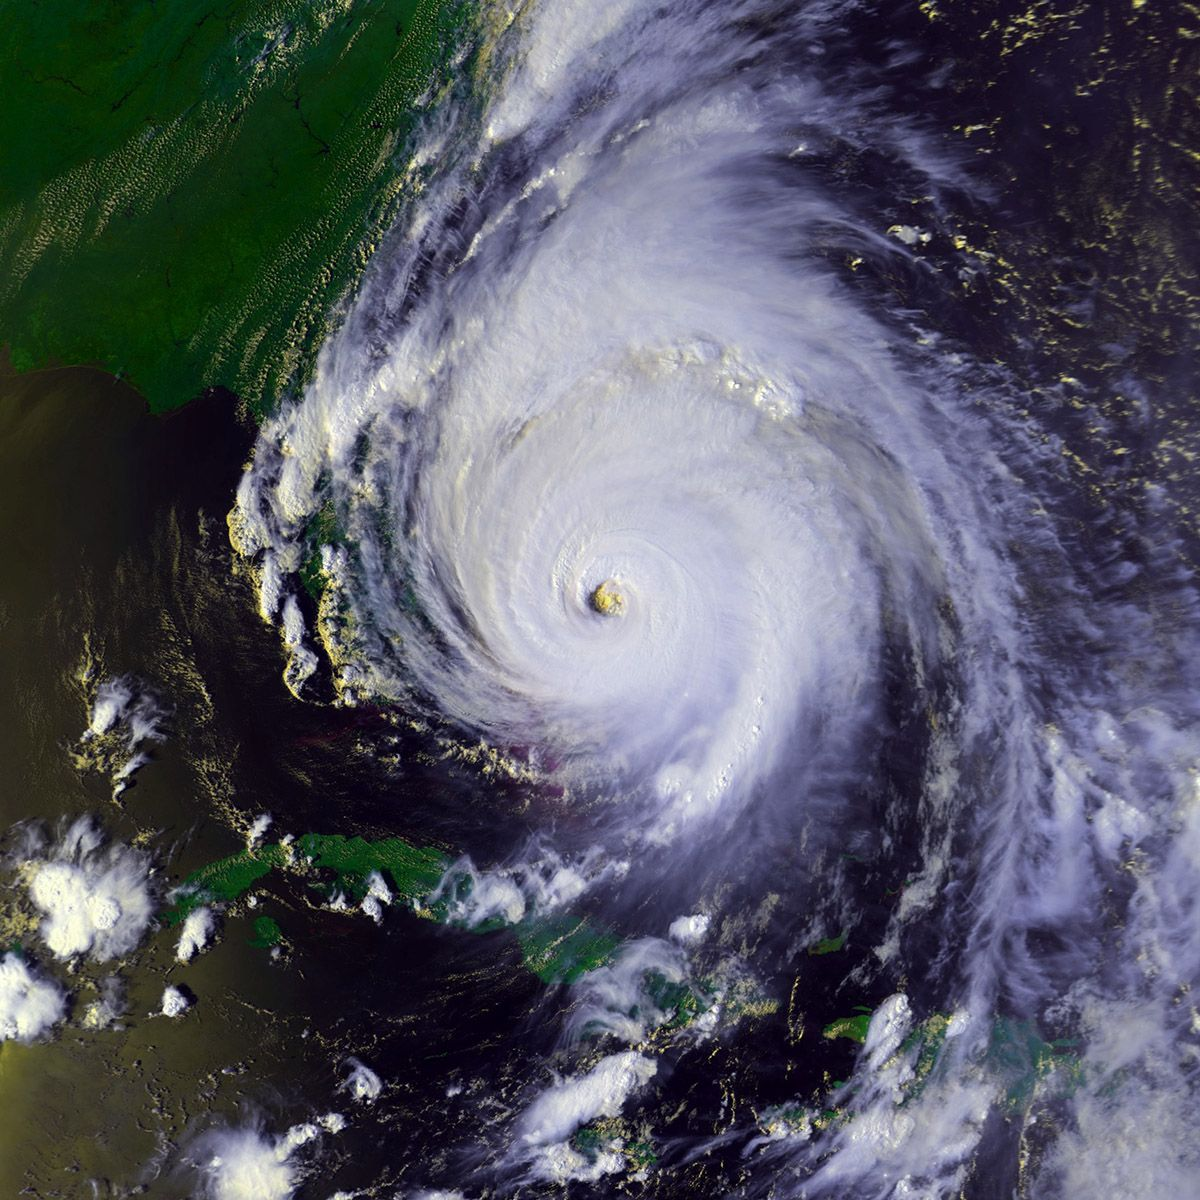 Hurricane Floyd Damage Billion Usd 6 9 Season 1999 Category 4 Deaths 56 Areas Affected The Bahamas Hurricane Floyd Atlantic Hurricane Hurricane History